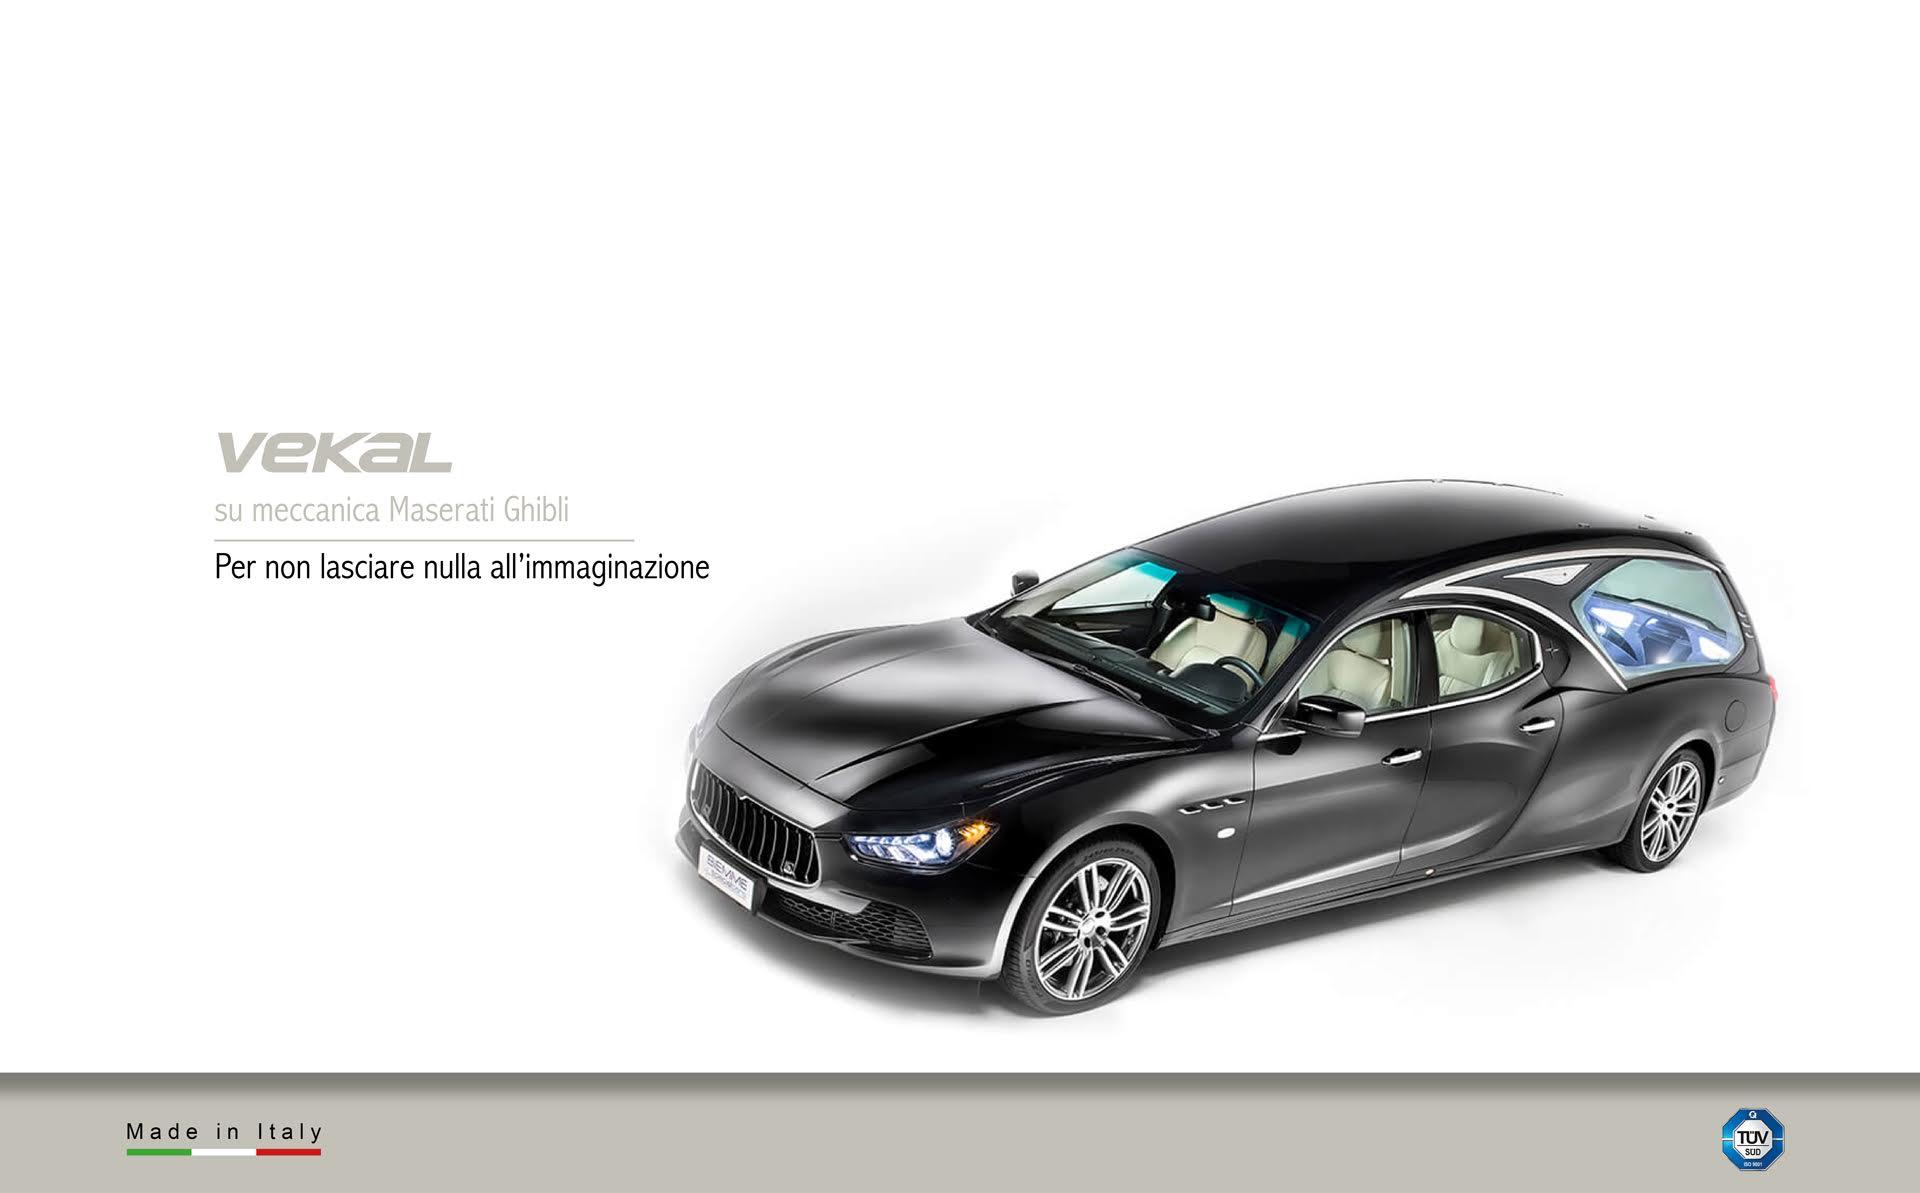 Hearse meccanical Maserati Ghibli